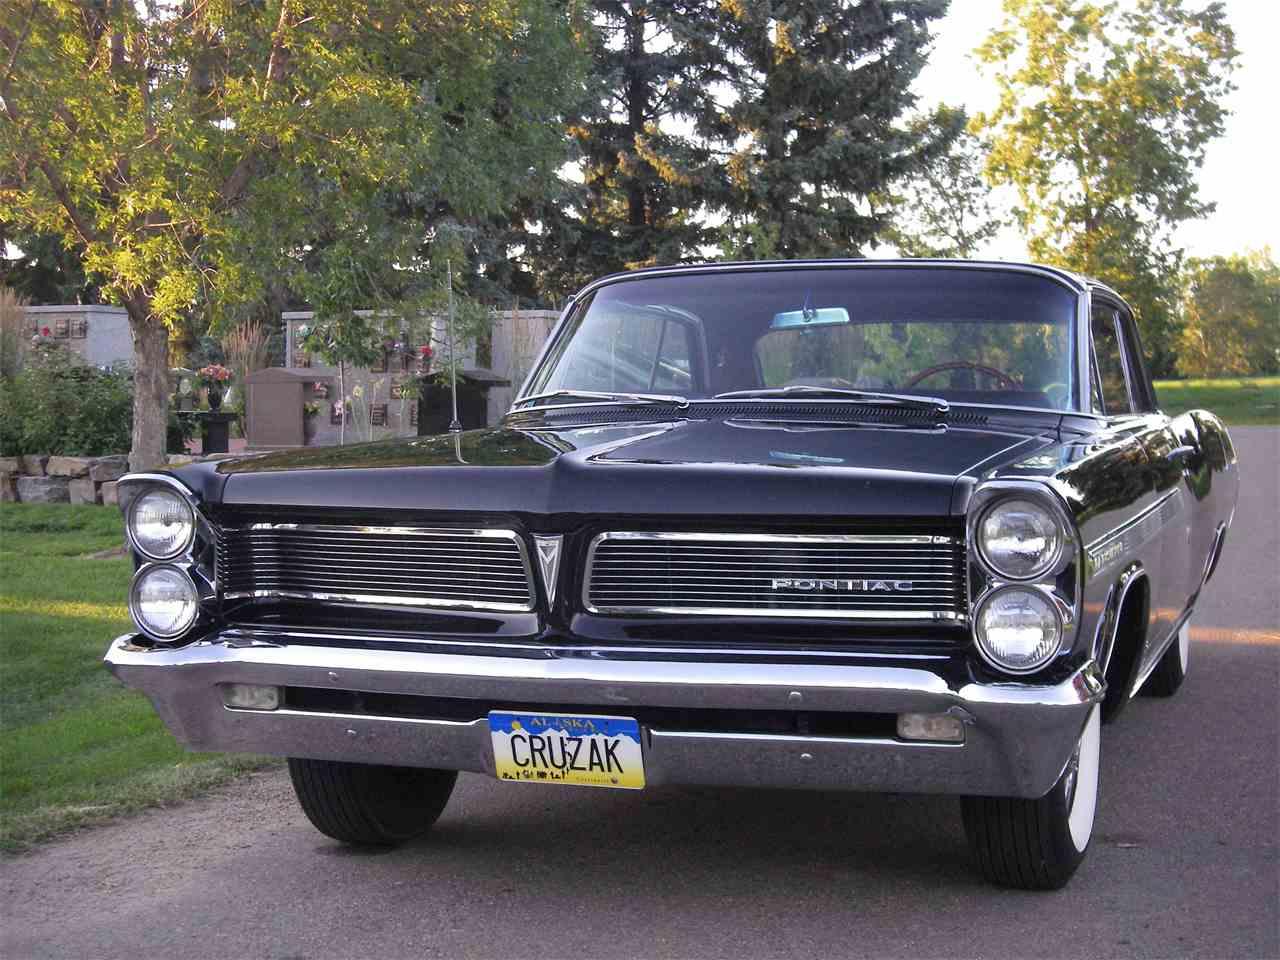 Edmonton Alberta Used Vehicles Cars Trucks Suvs For Sale: 1963 Pontiac Parisienne For Sale